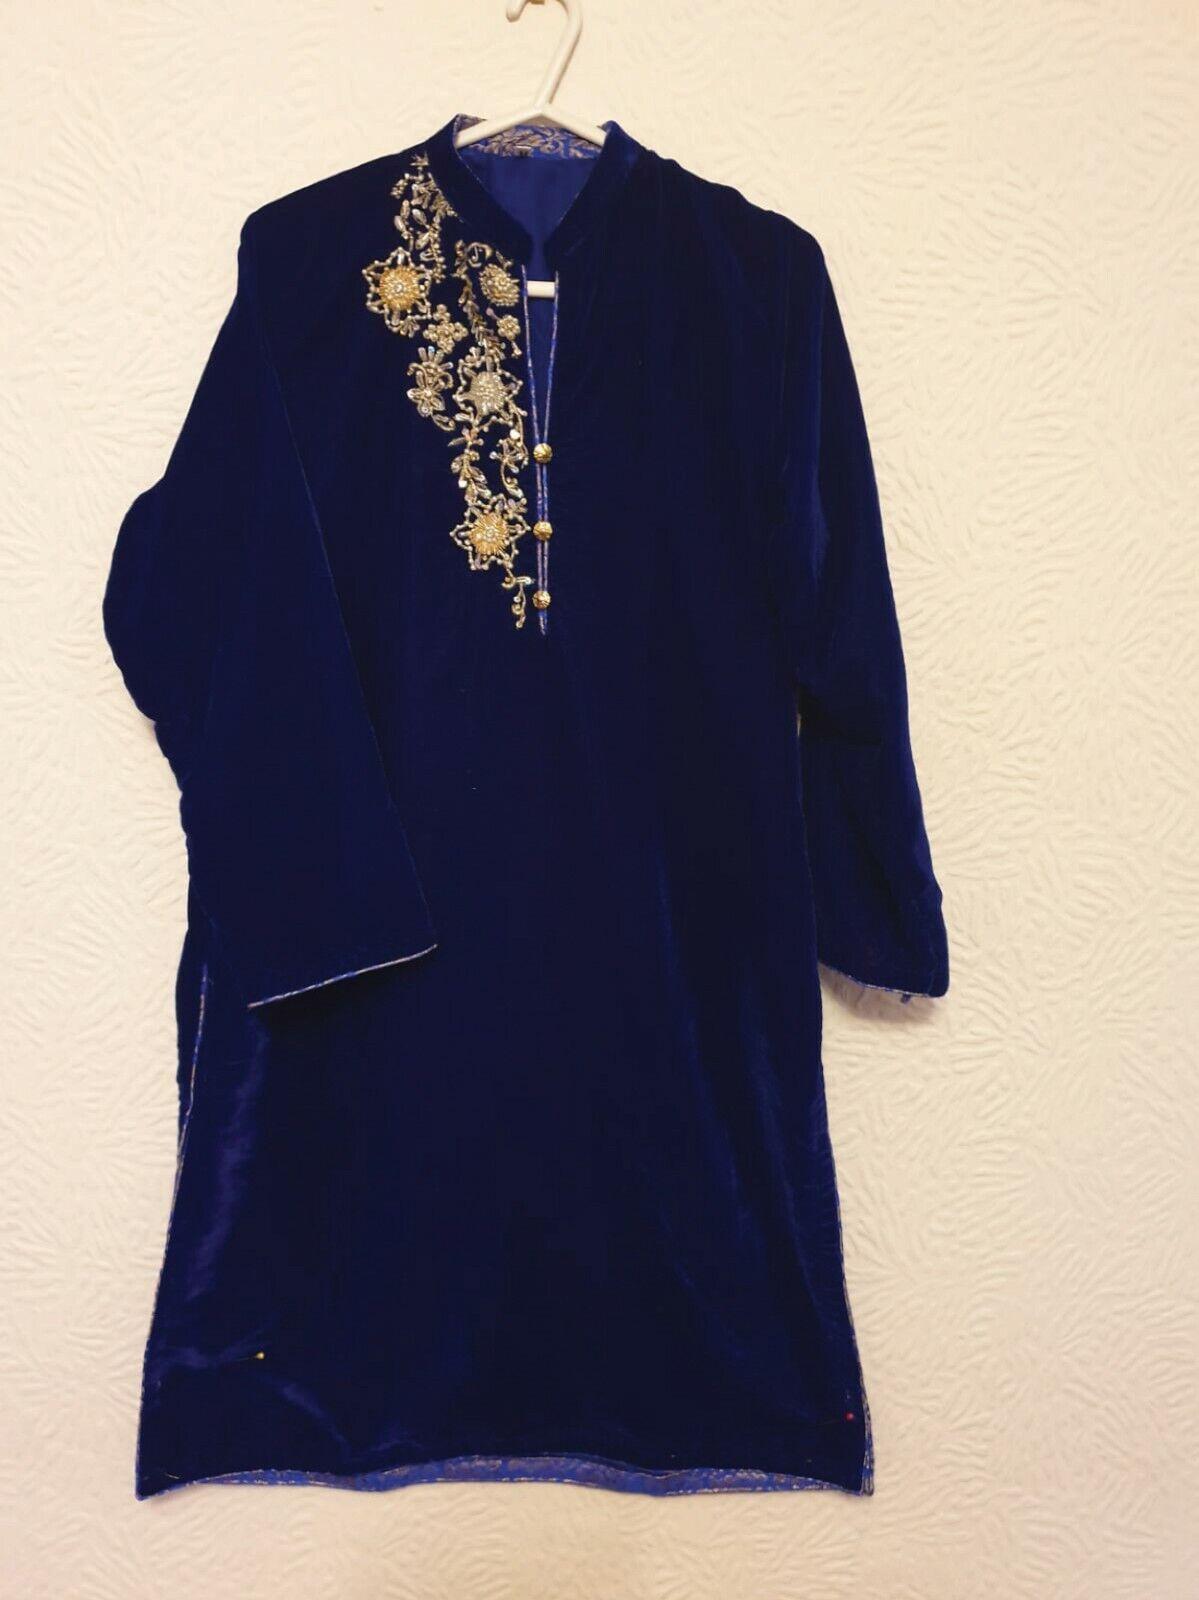 Micro Velvet Hand Embroidered Asian Ready Made Shirt/Kurti Navy Blue /V